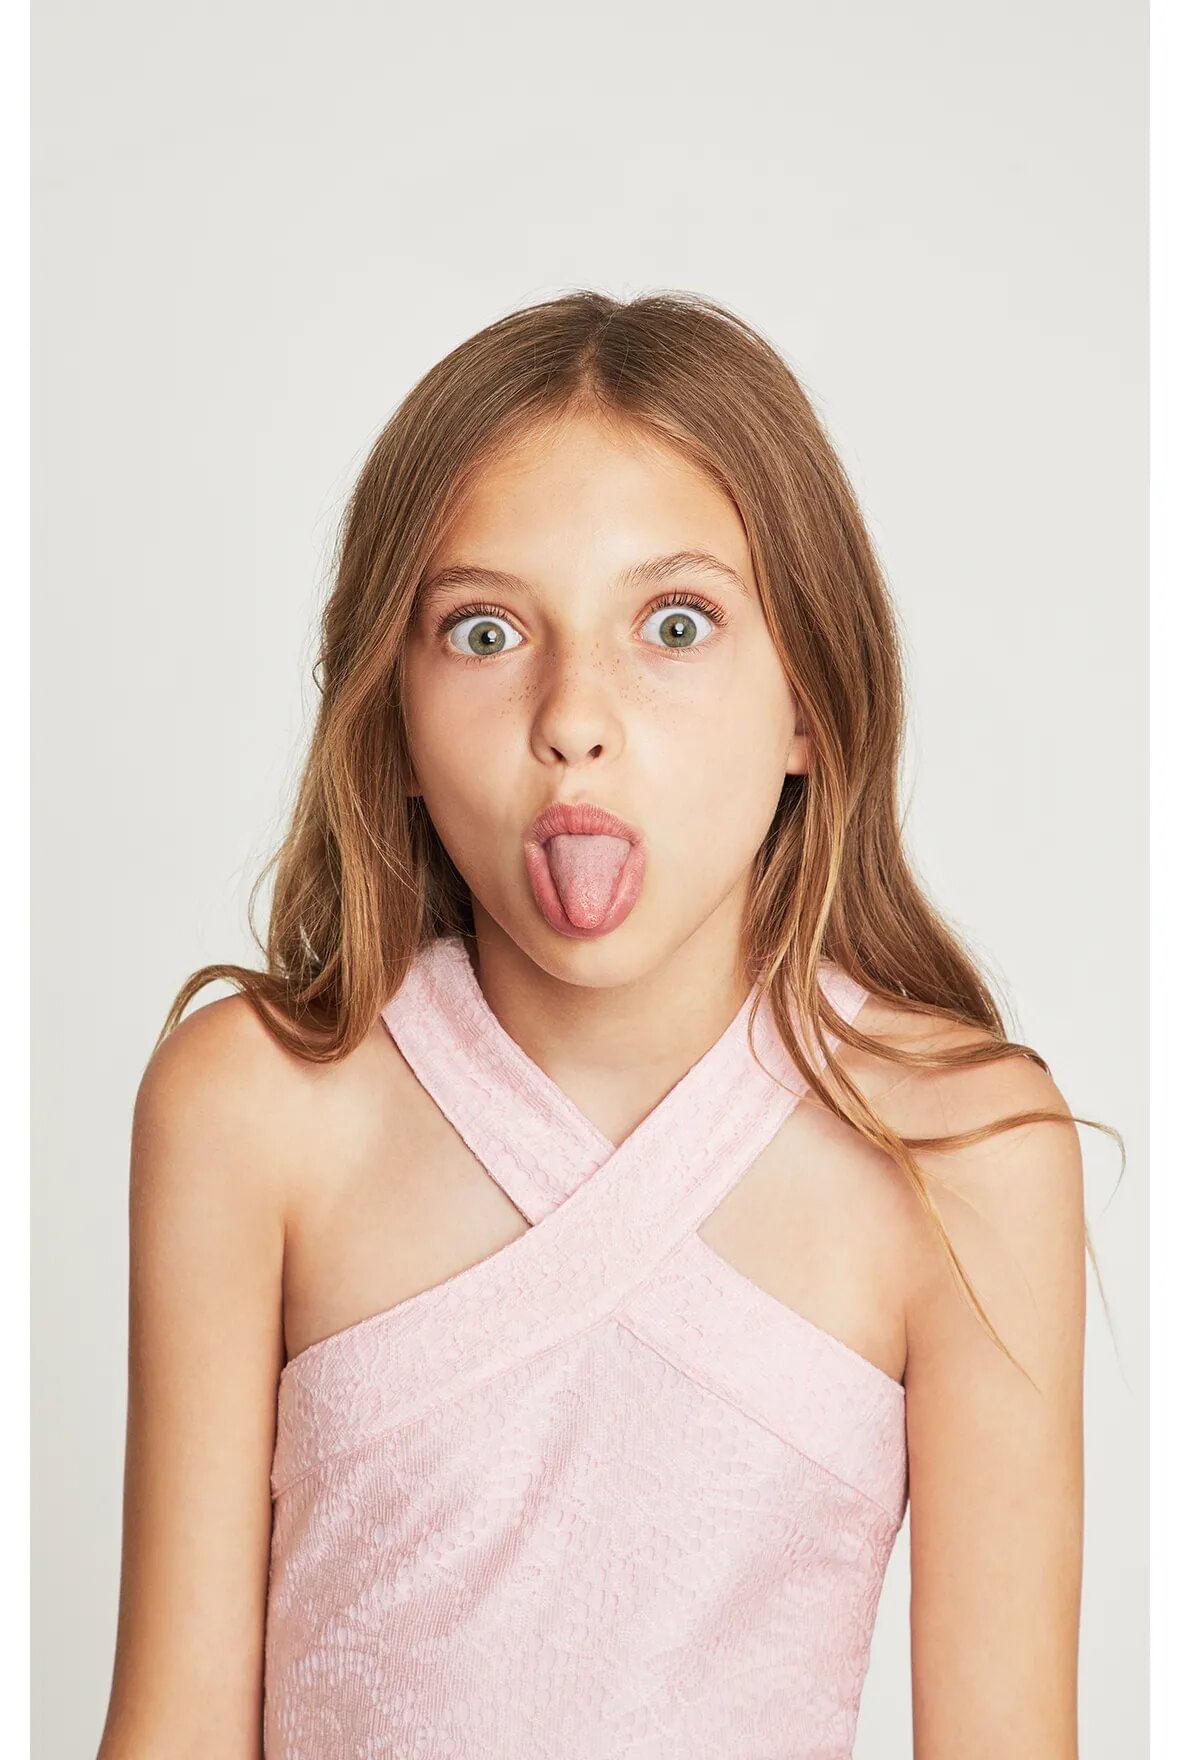 Vestido-halter-BCBGirls-rosa-claro-con-encaje-B838DR205_RPL_c